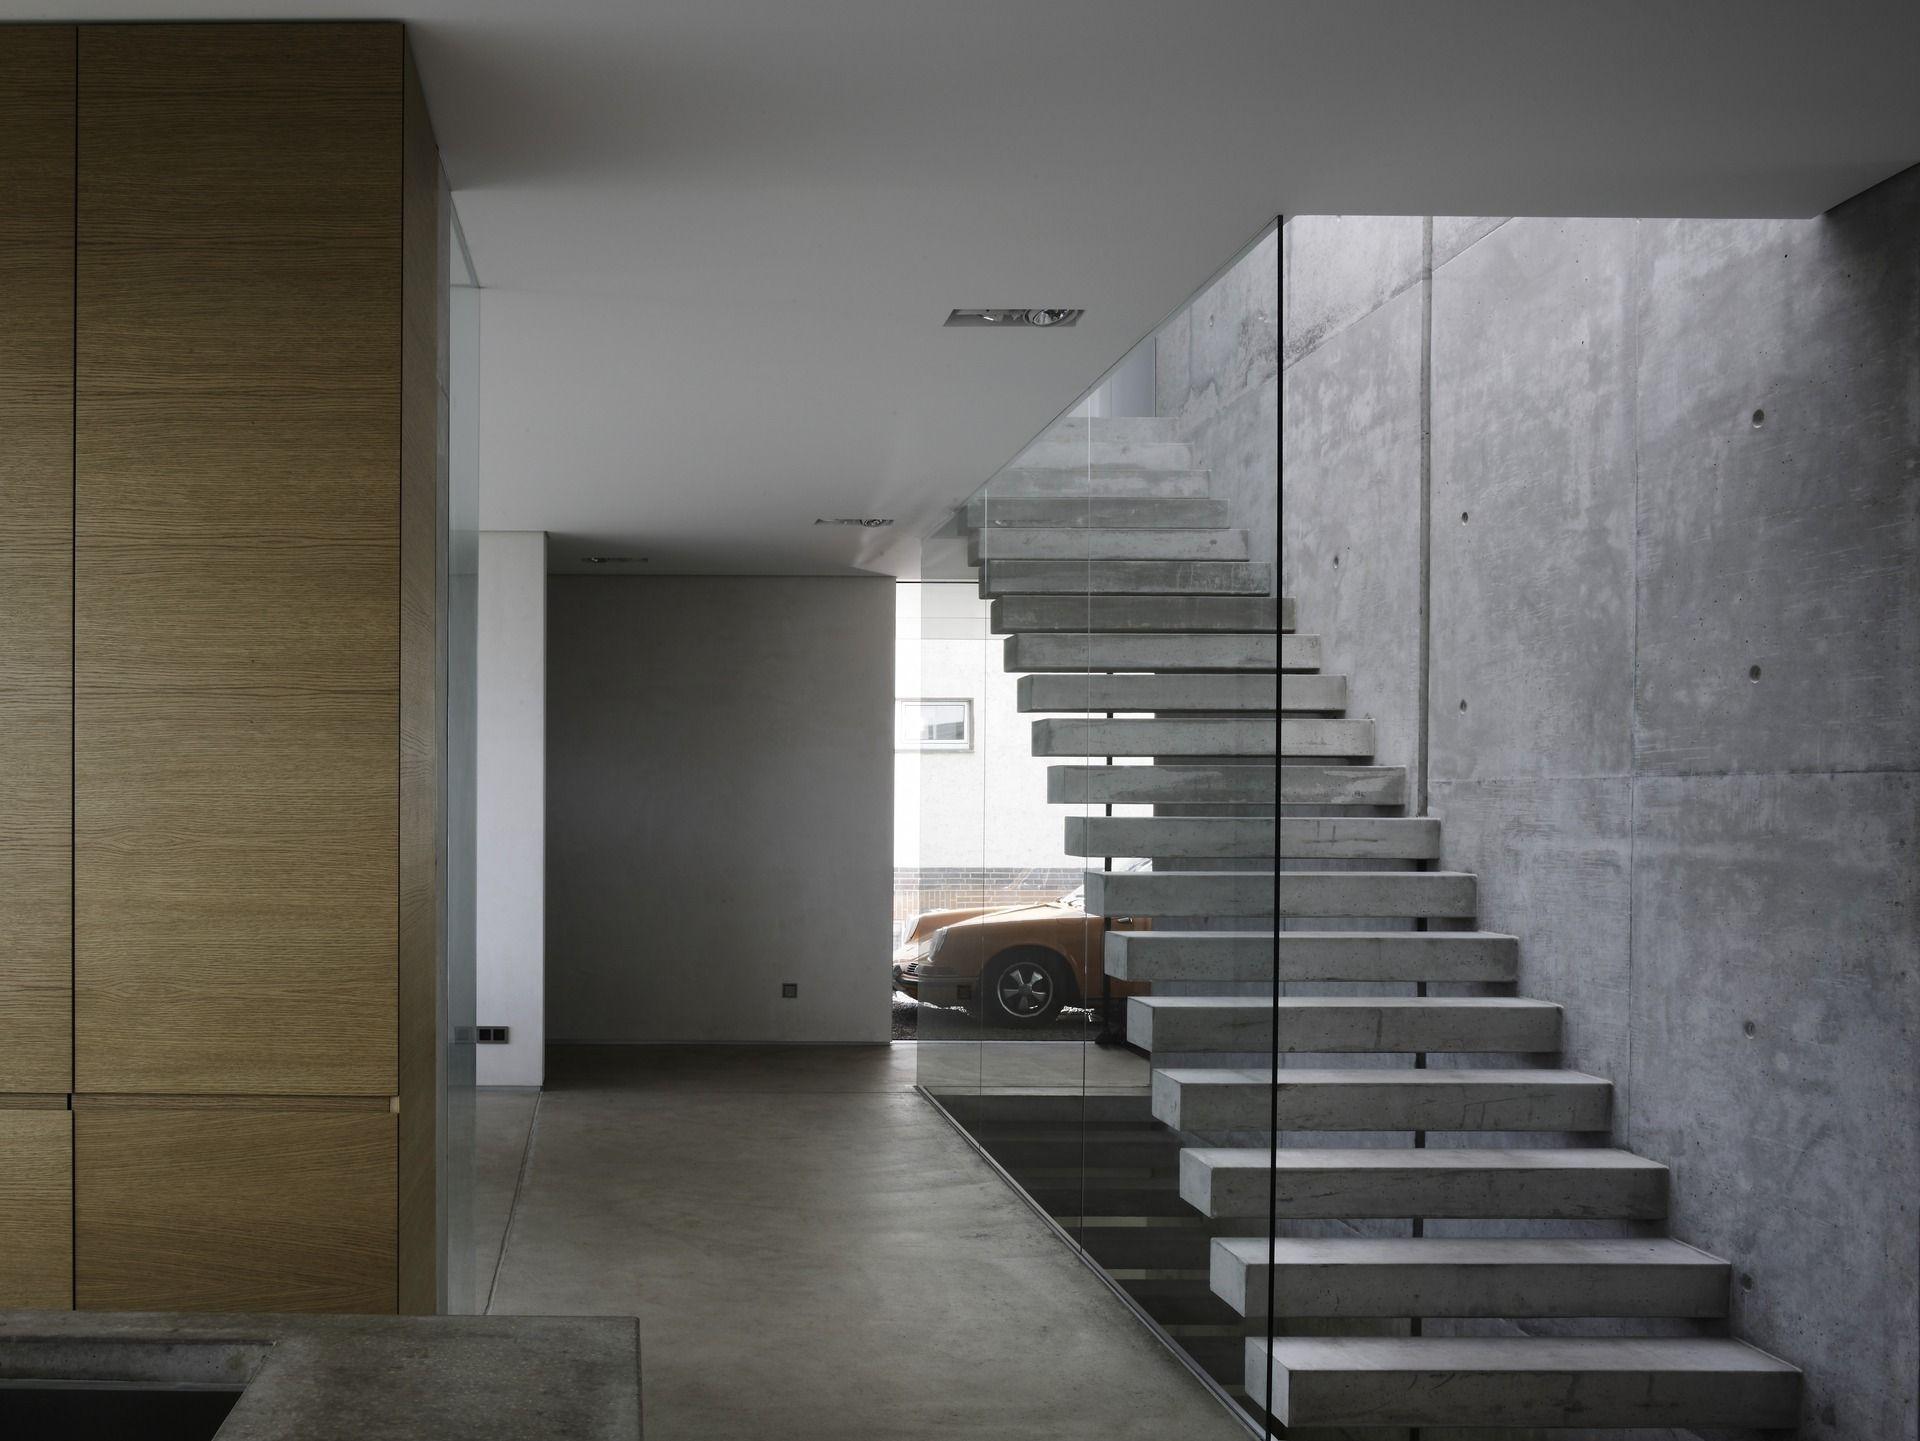 treppenkonstruktion aus beton und glas. Black Bedroom Furniture Sets. Home Design Ideas